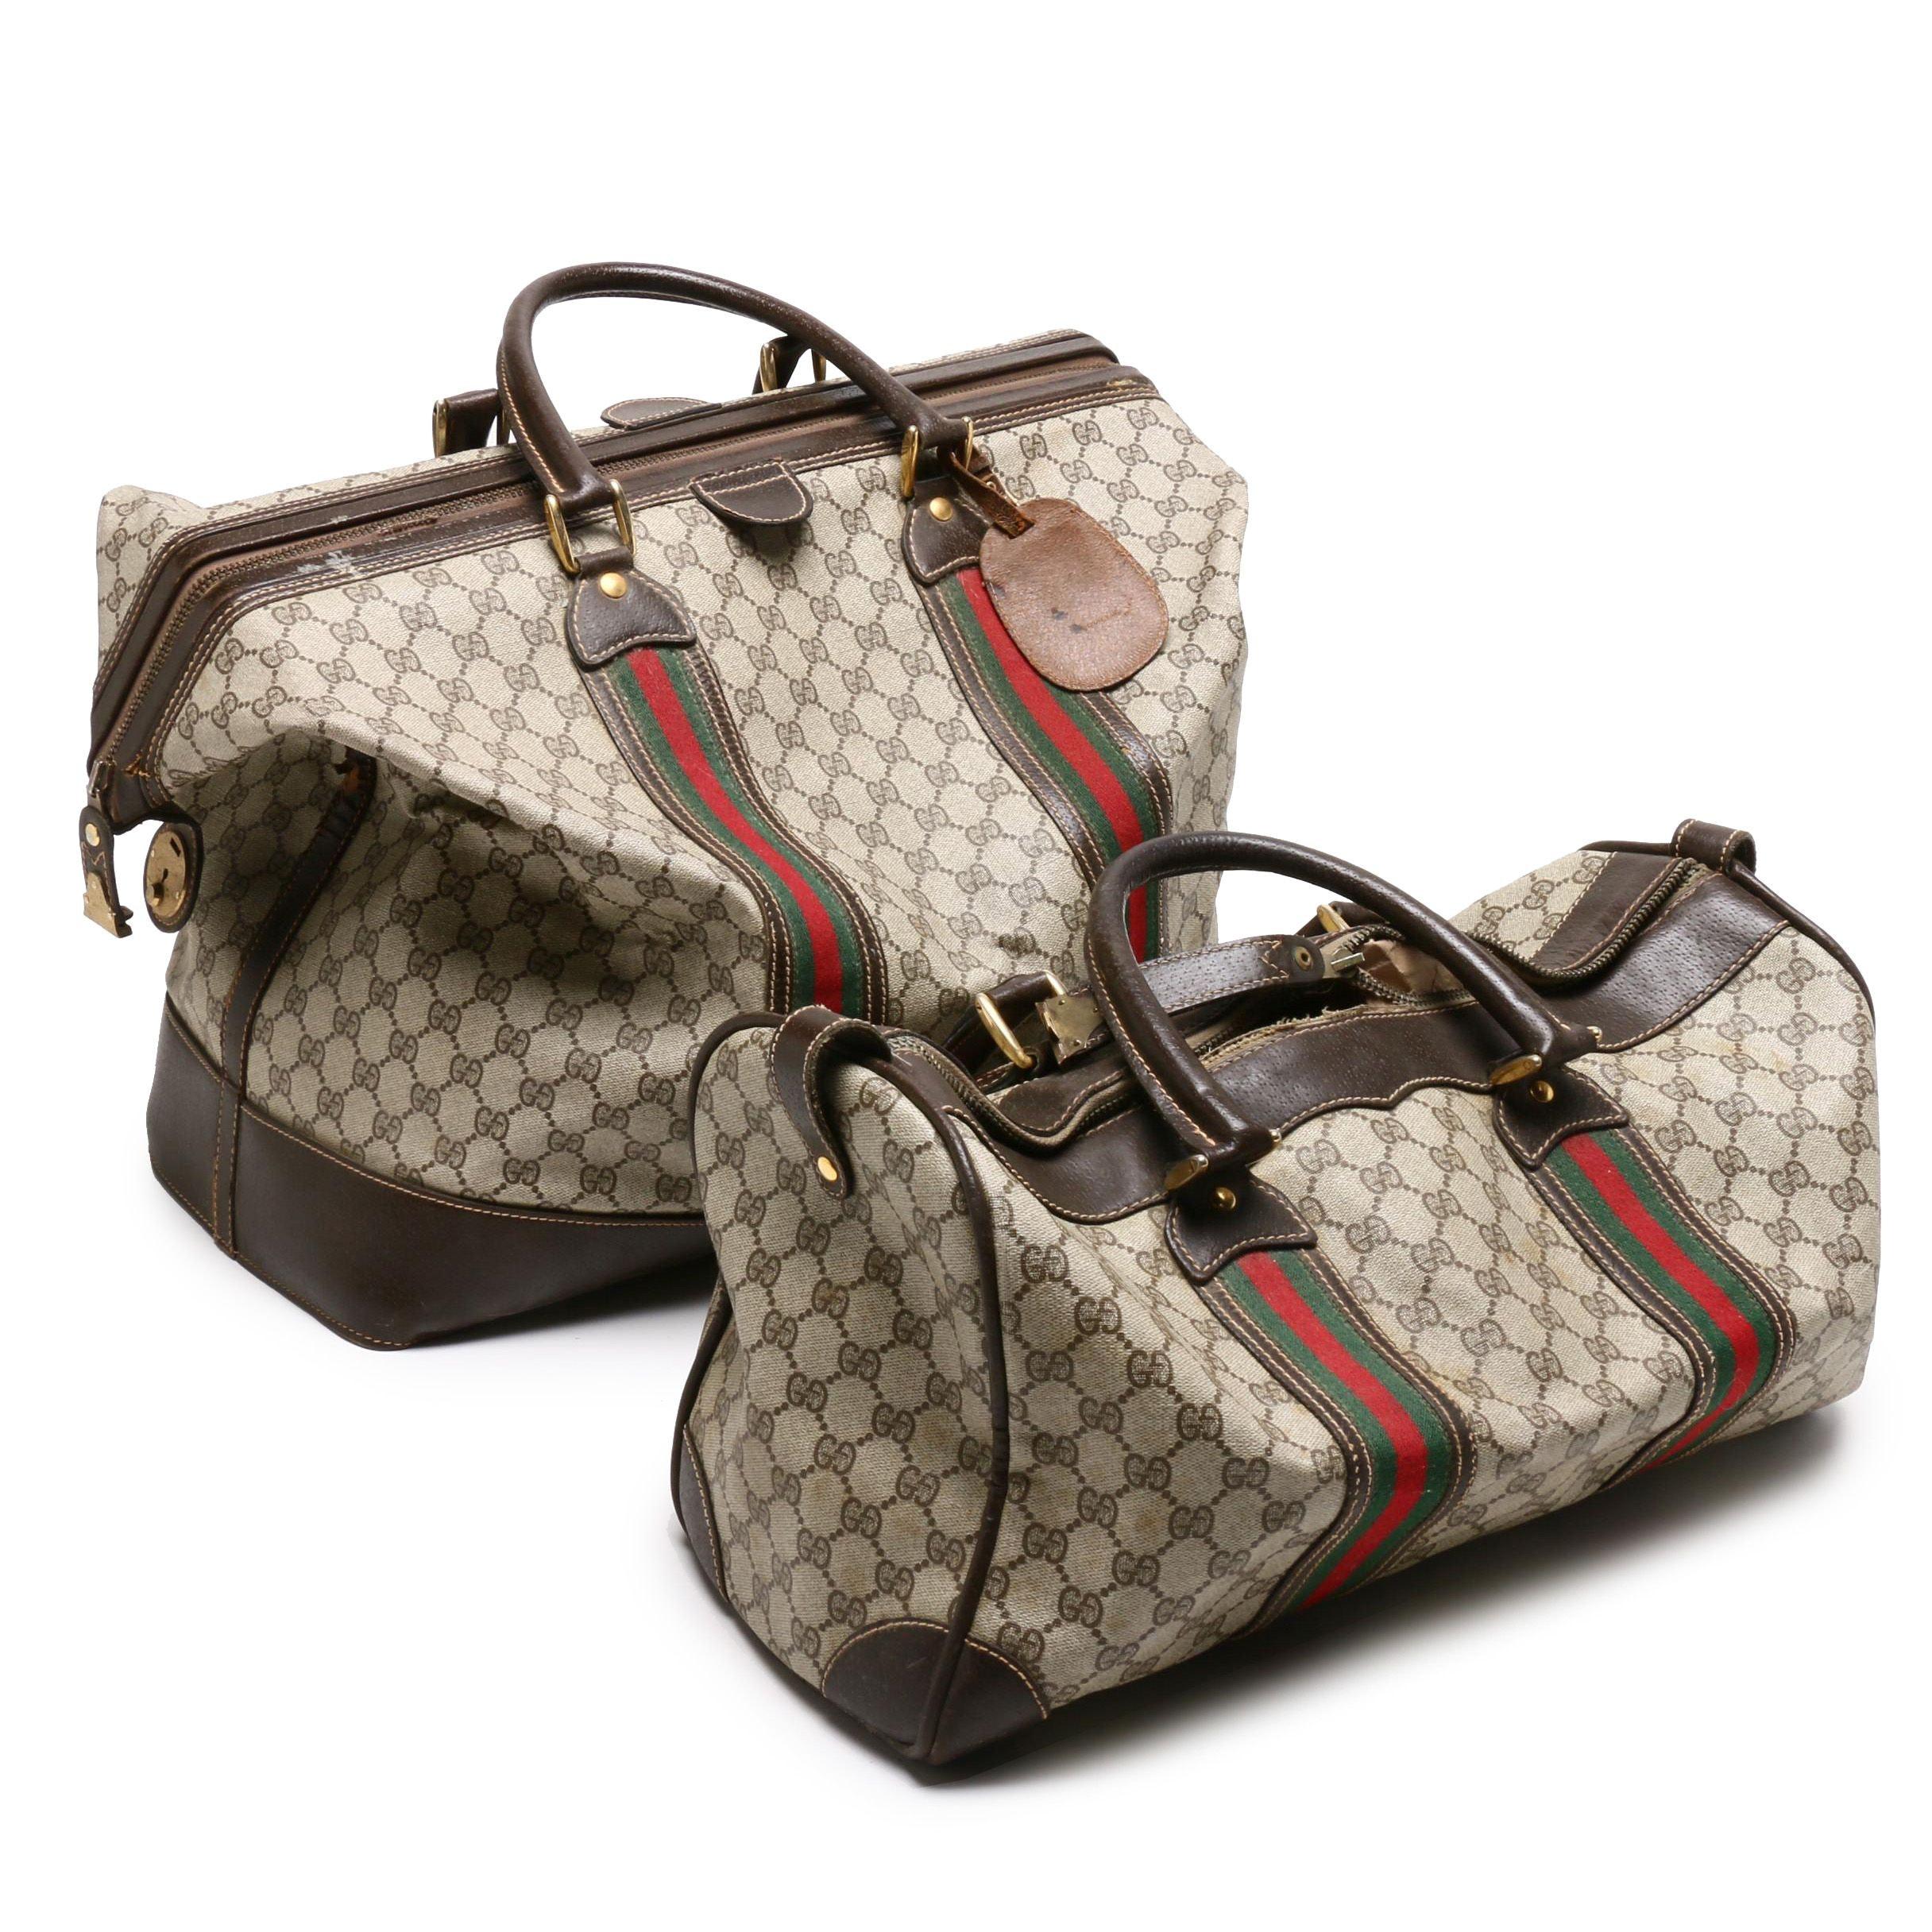 Gucci GG Supreme Canvas Boston Sherry Web Duffle and Weekender Bag, Circa 1970